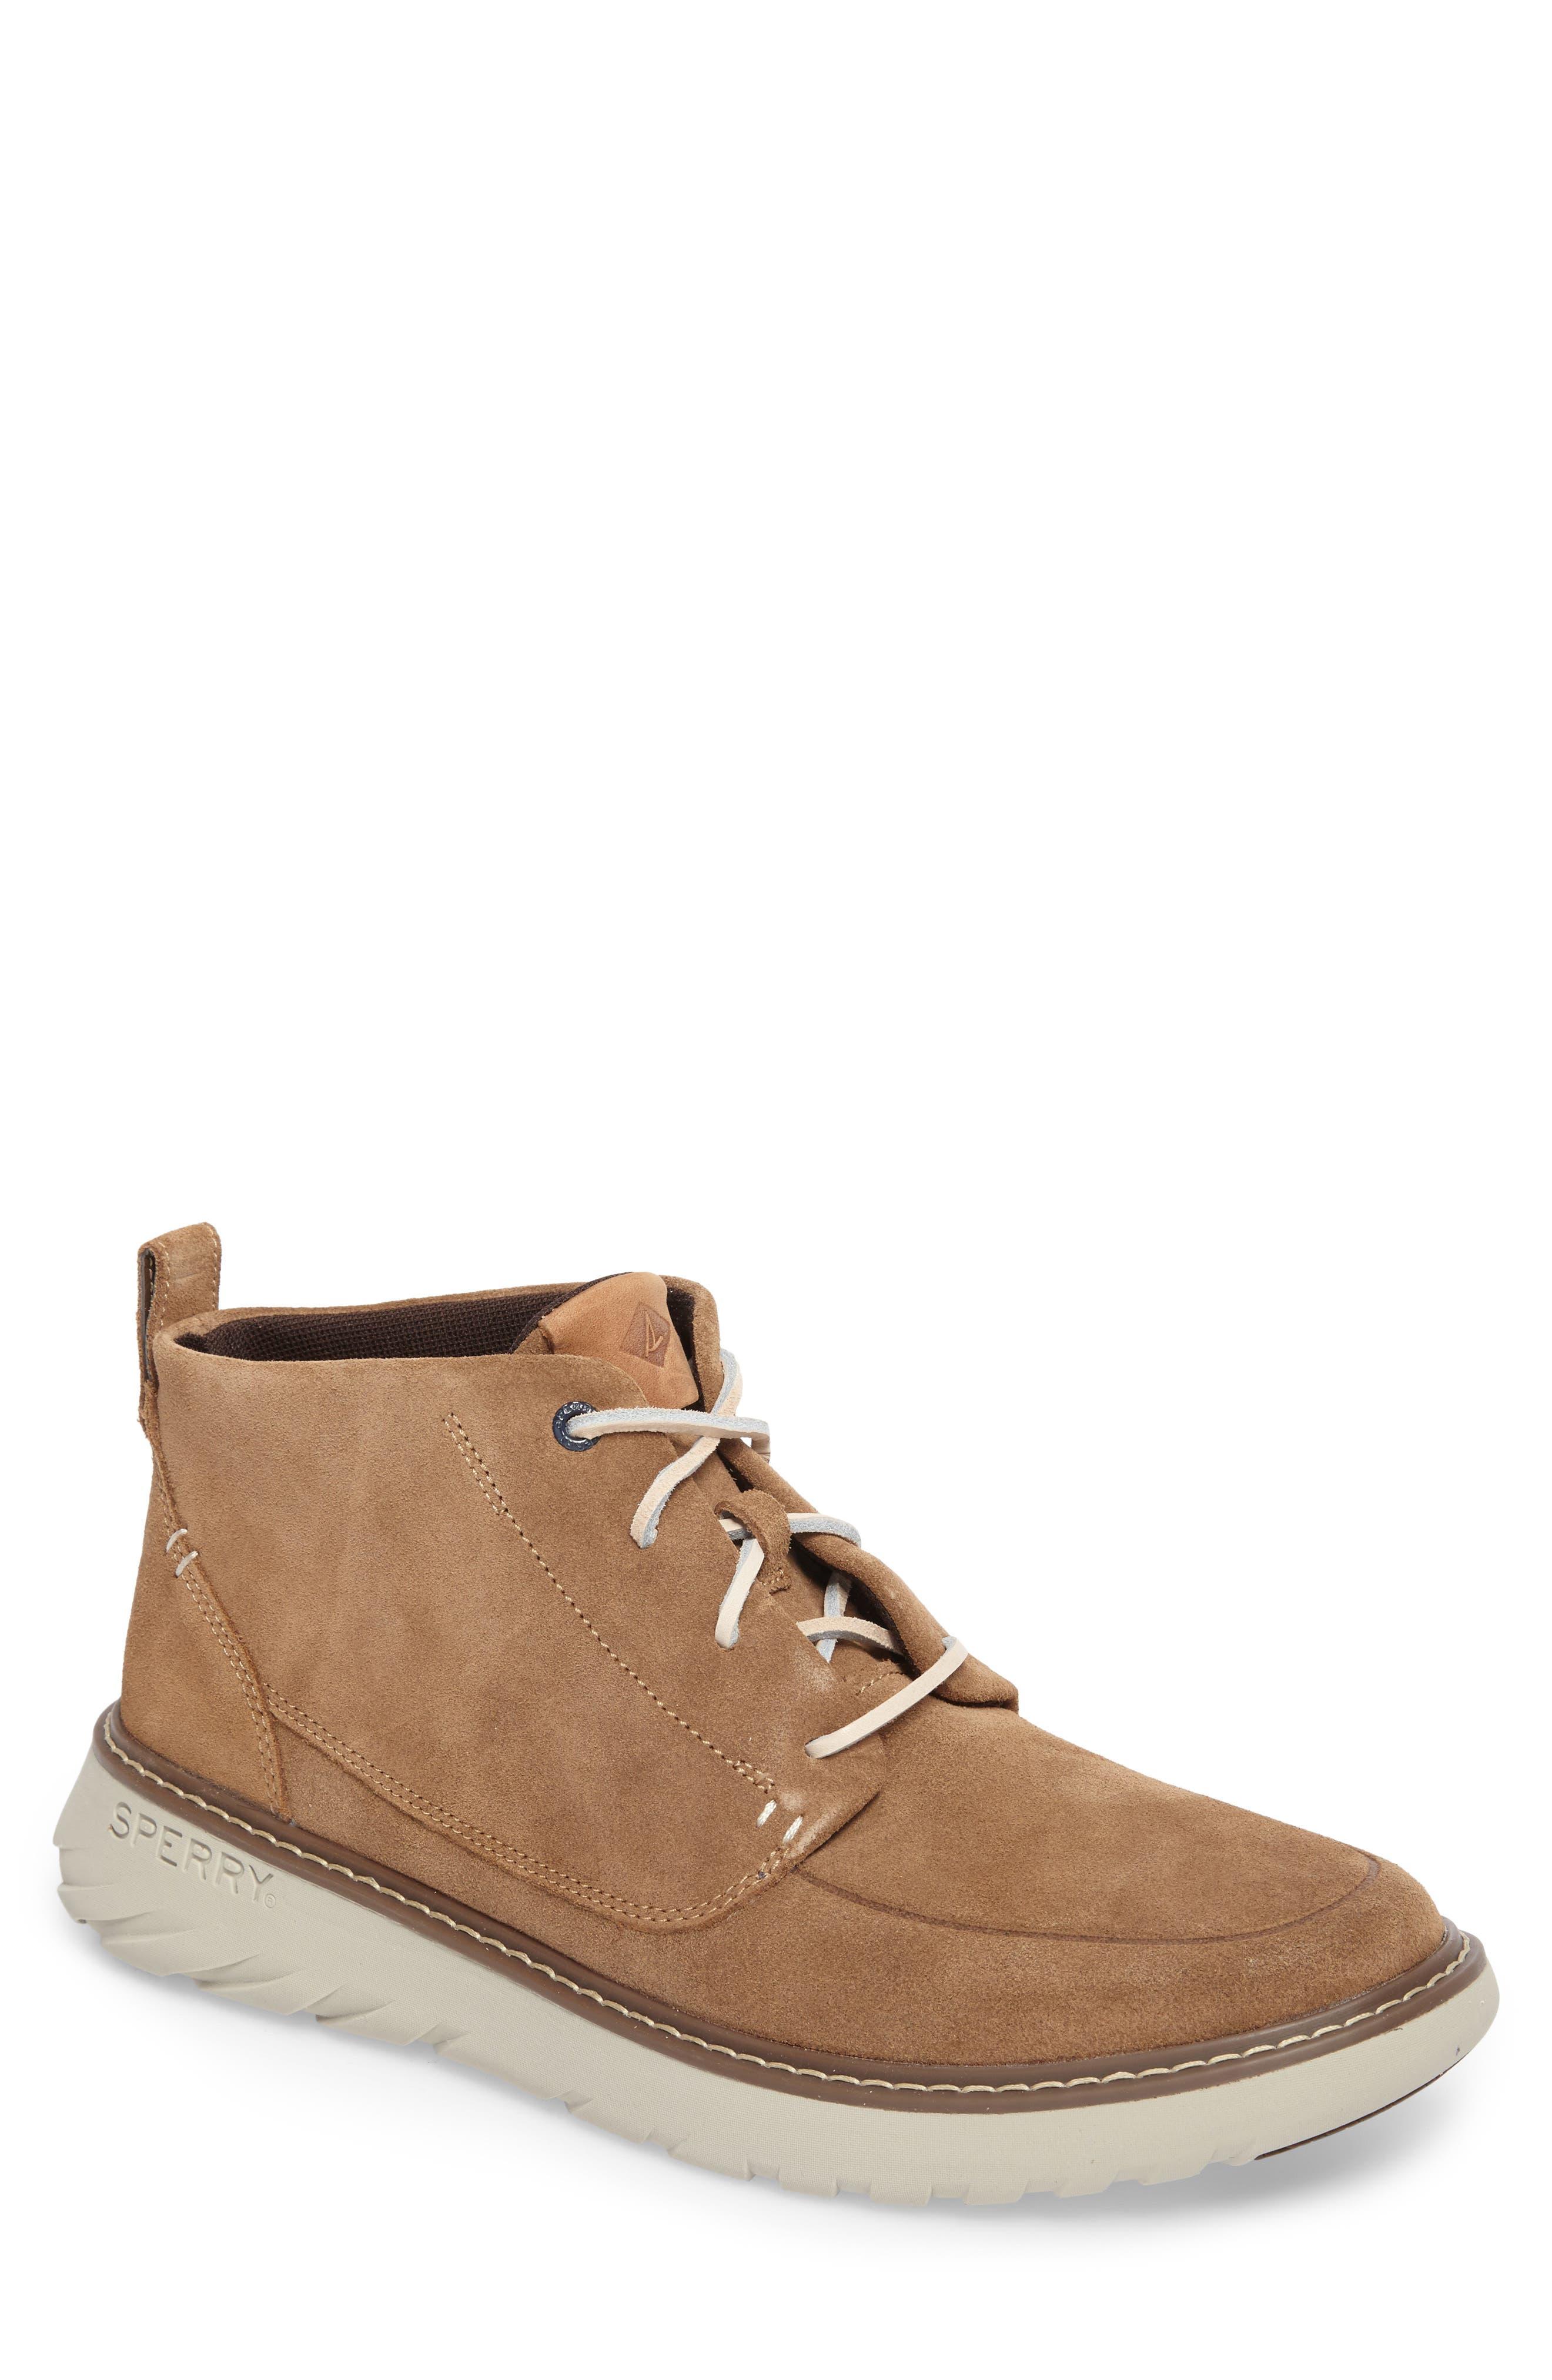 Element Chukka Boot,                         Main,                         color, Caramel Leather